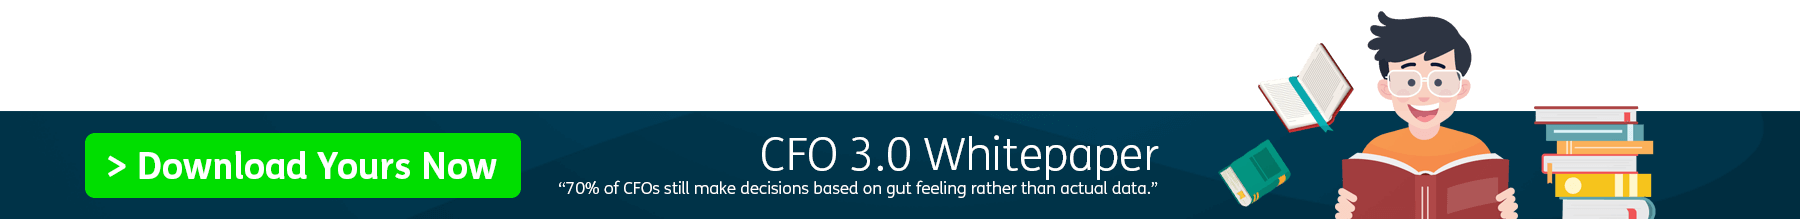 CFO 3.0 Whitepaper CTA Digital Transformation